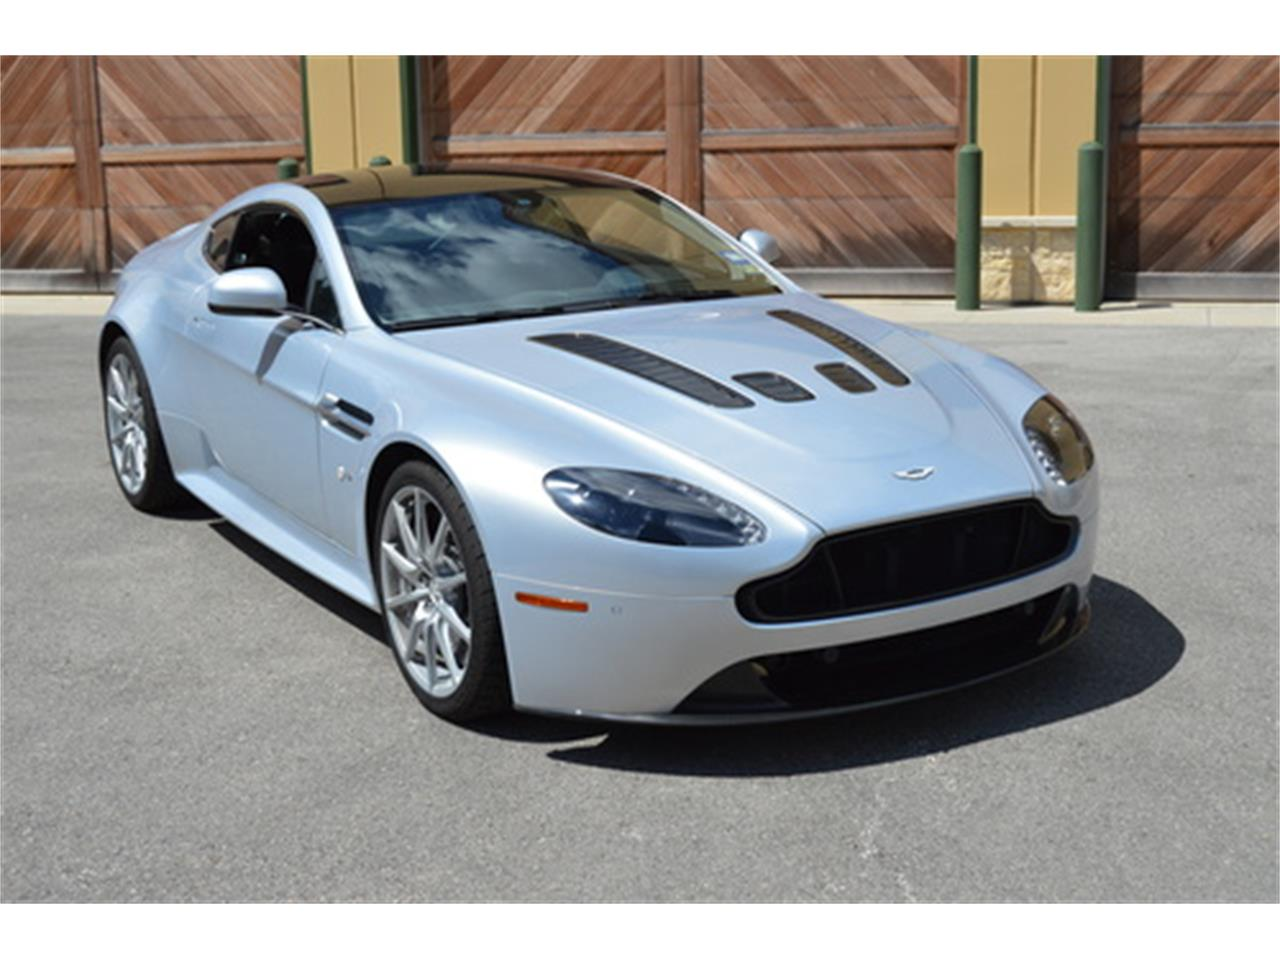 2015 Aston Martin Vantage For Sale In San Antonio Tx Classiccarsbay Com